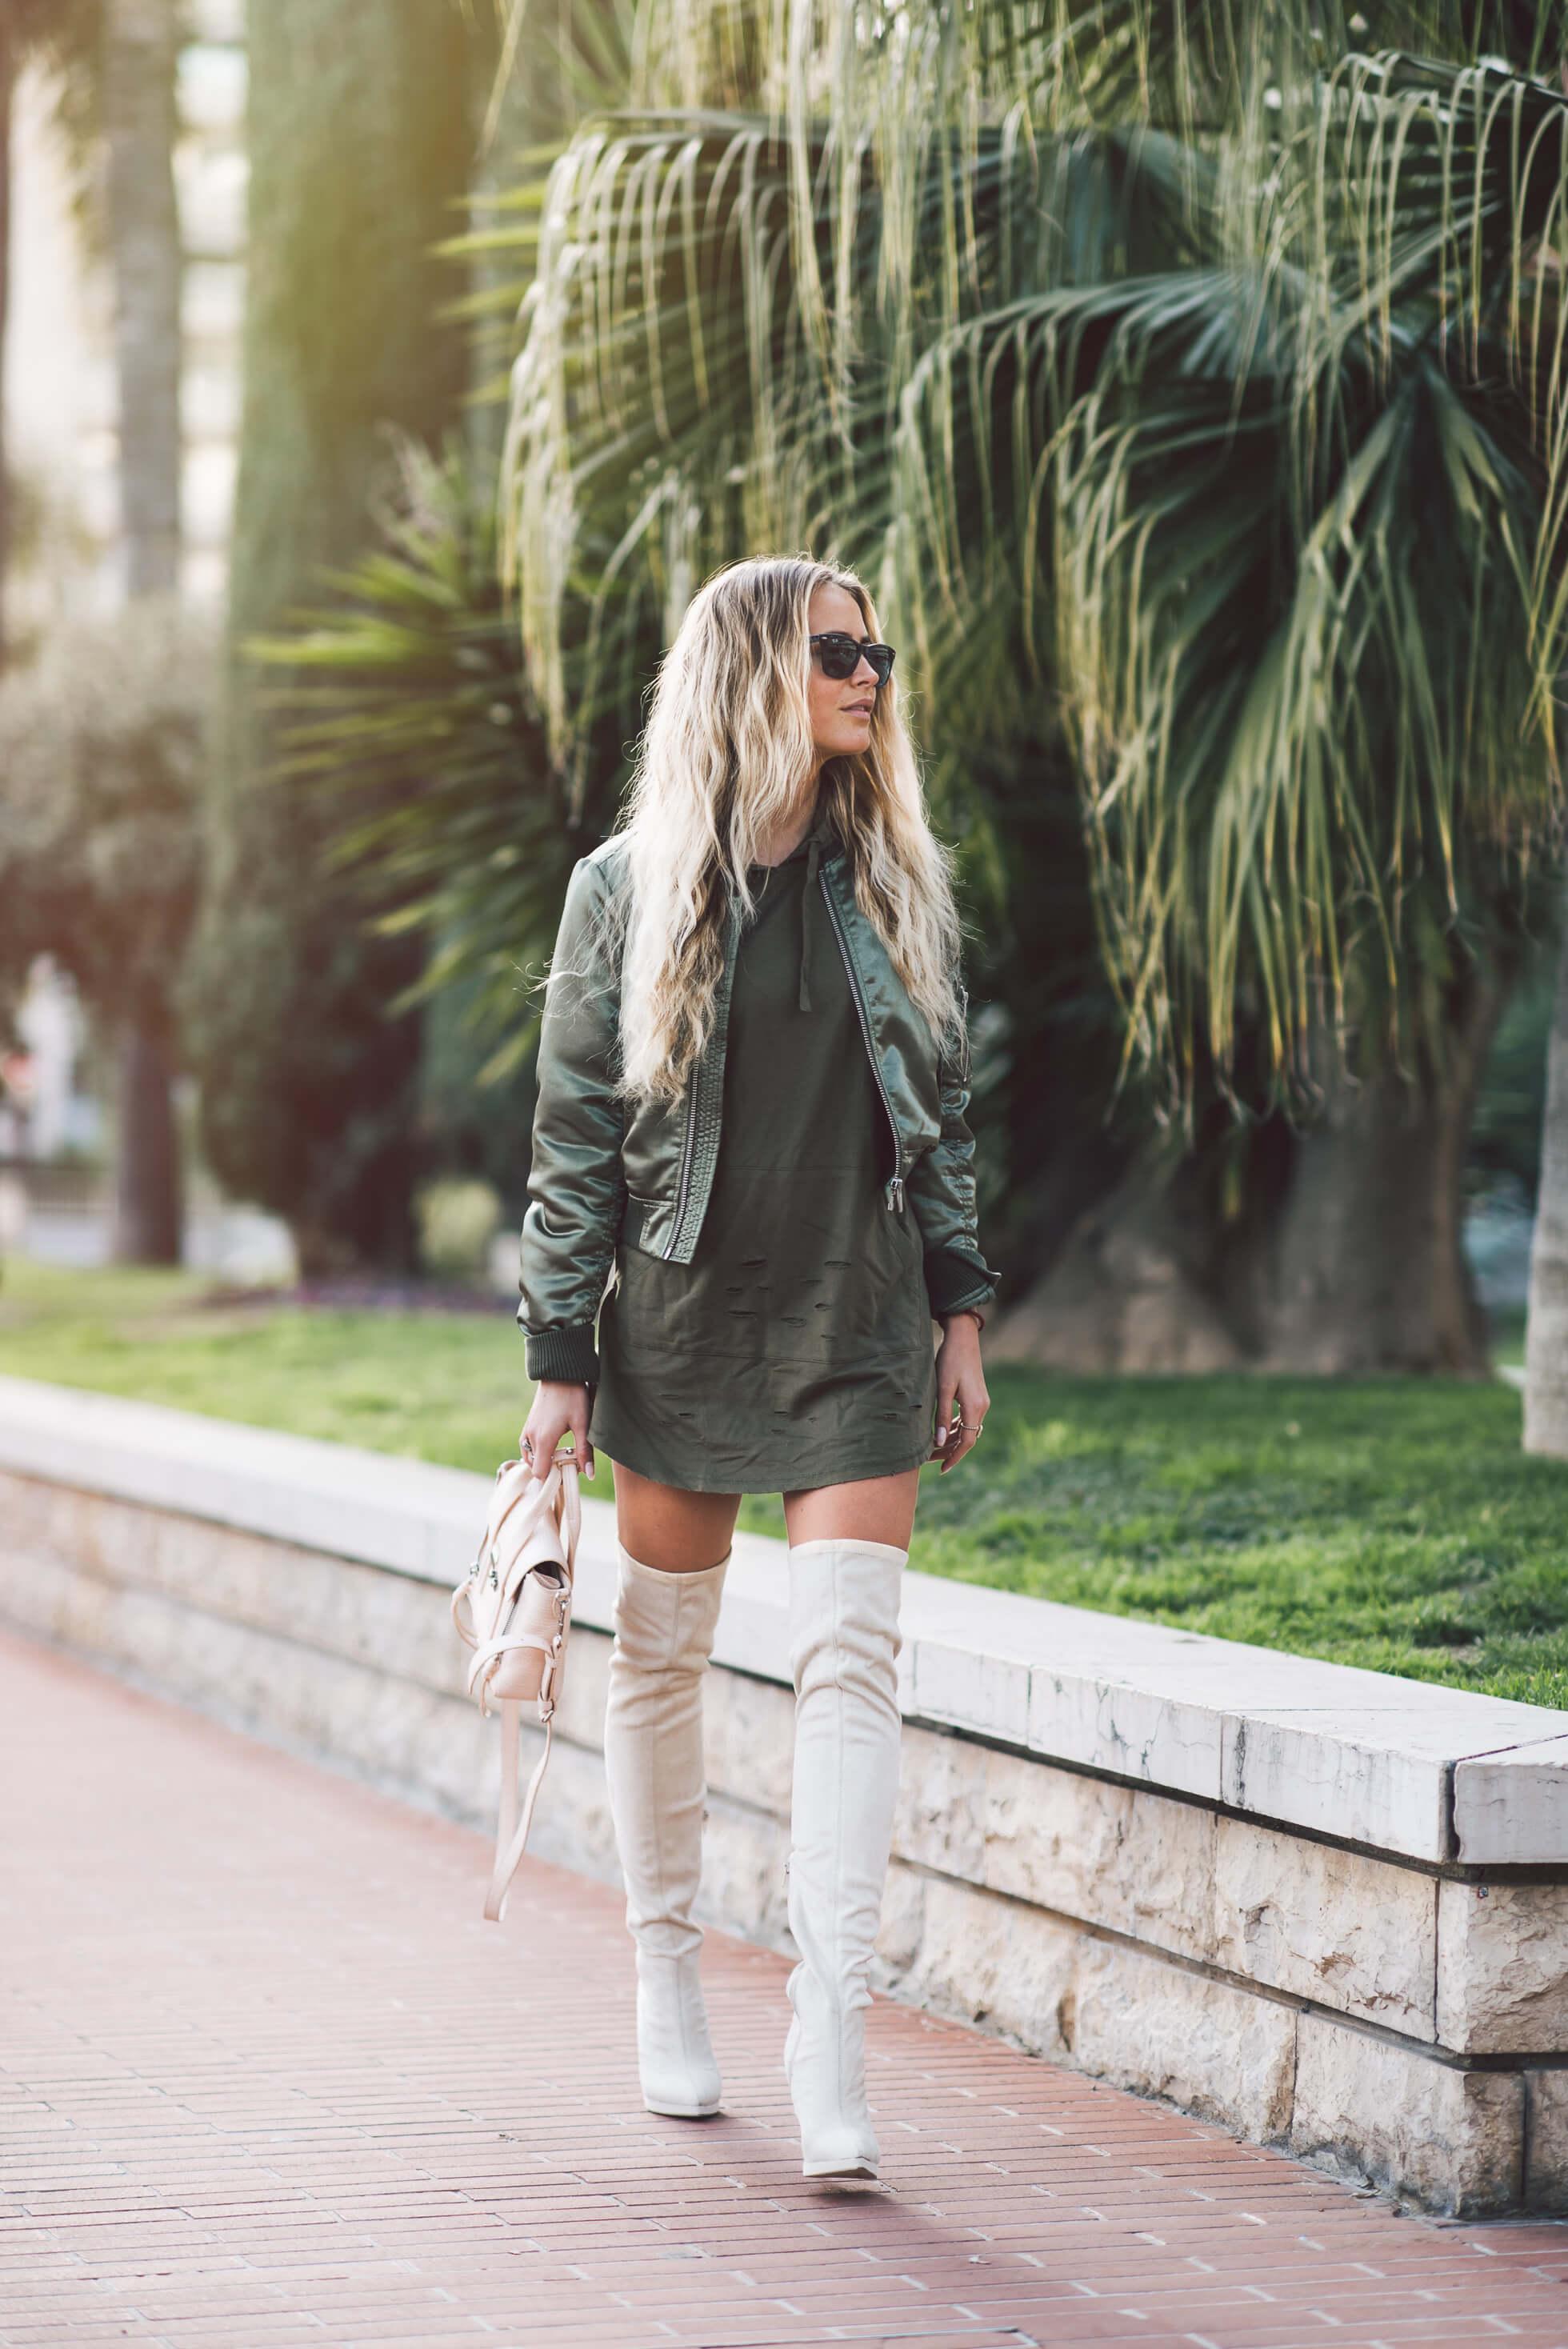 janni-deler-green-outfitDSC_9120-Redigera